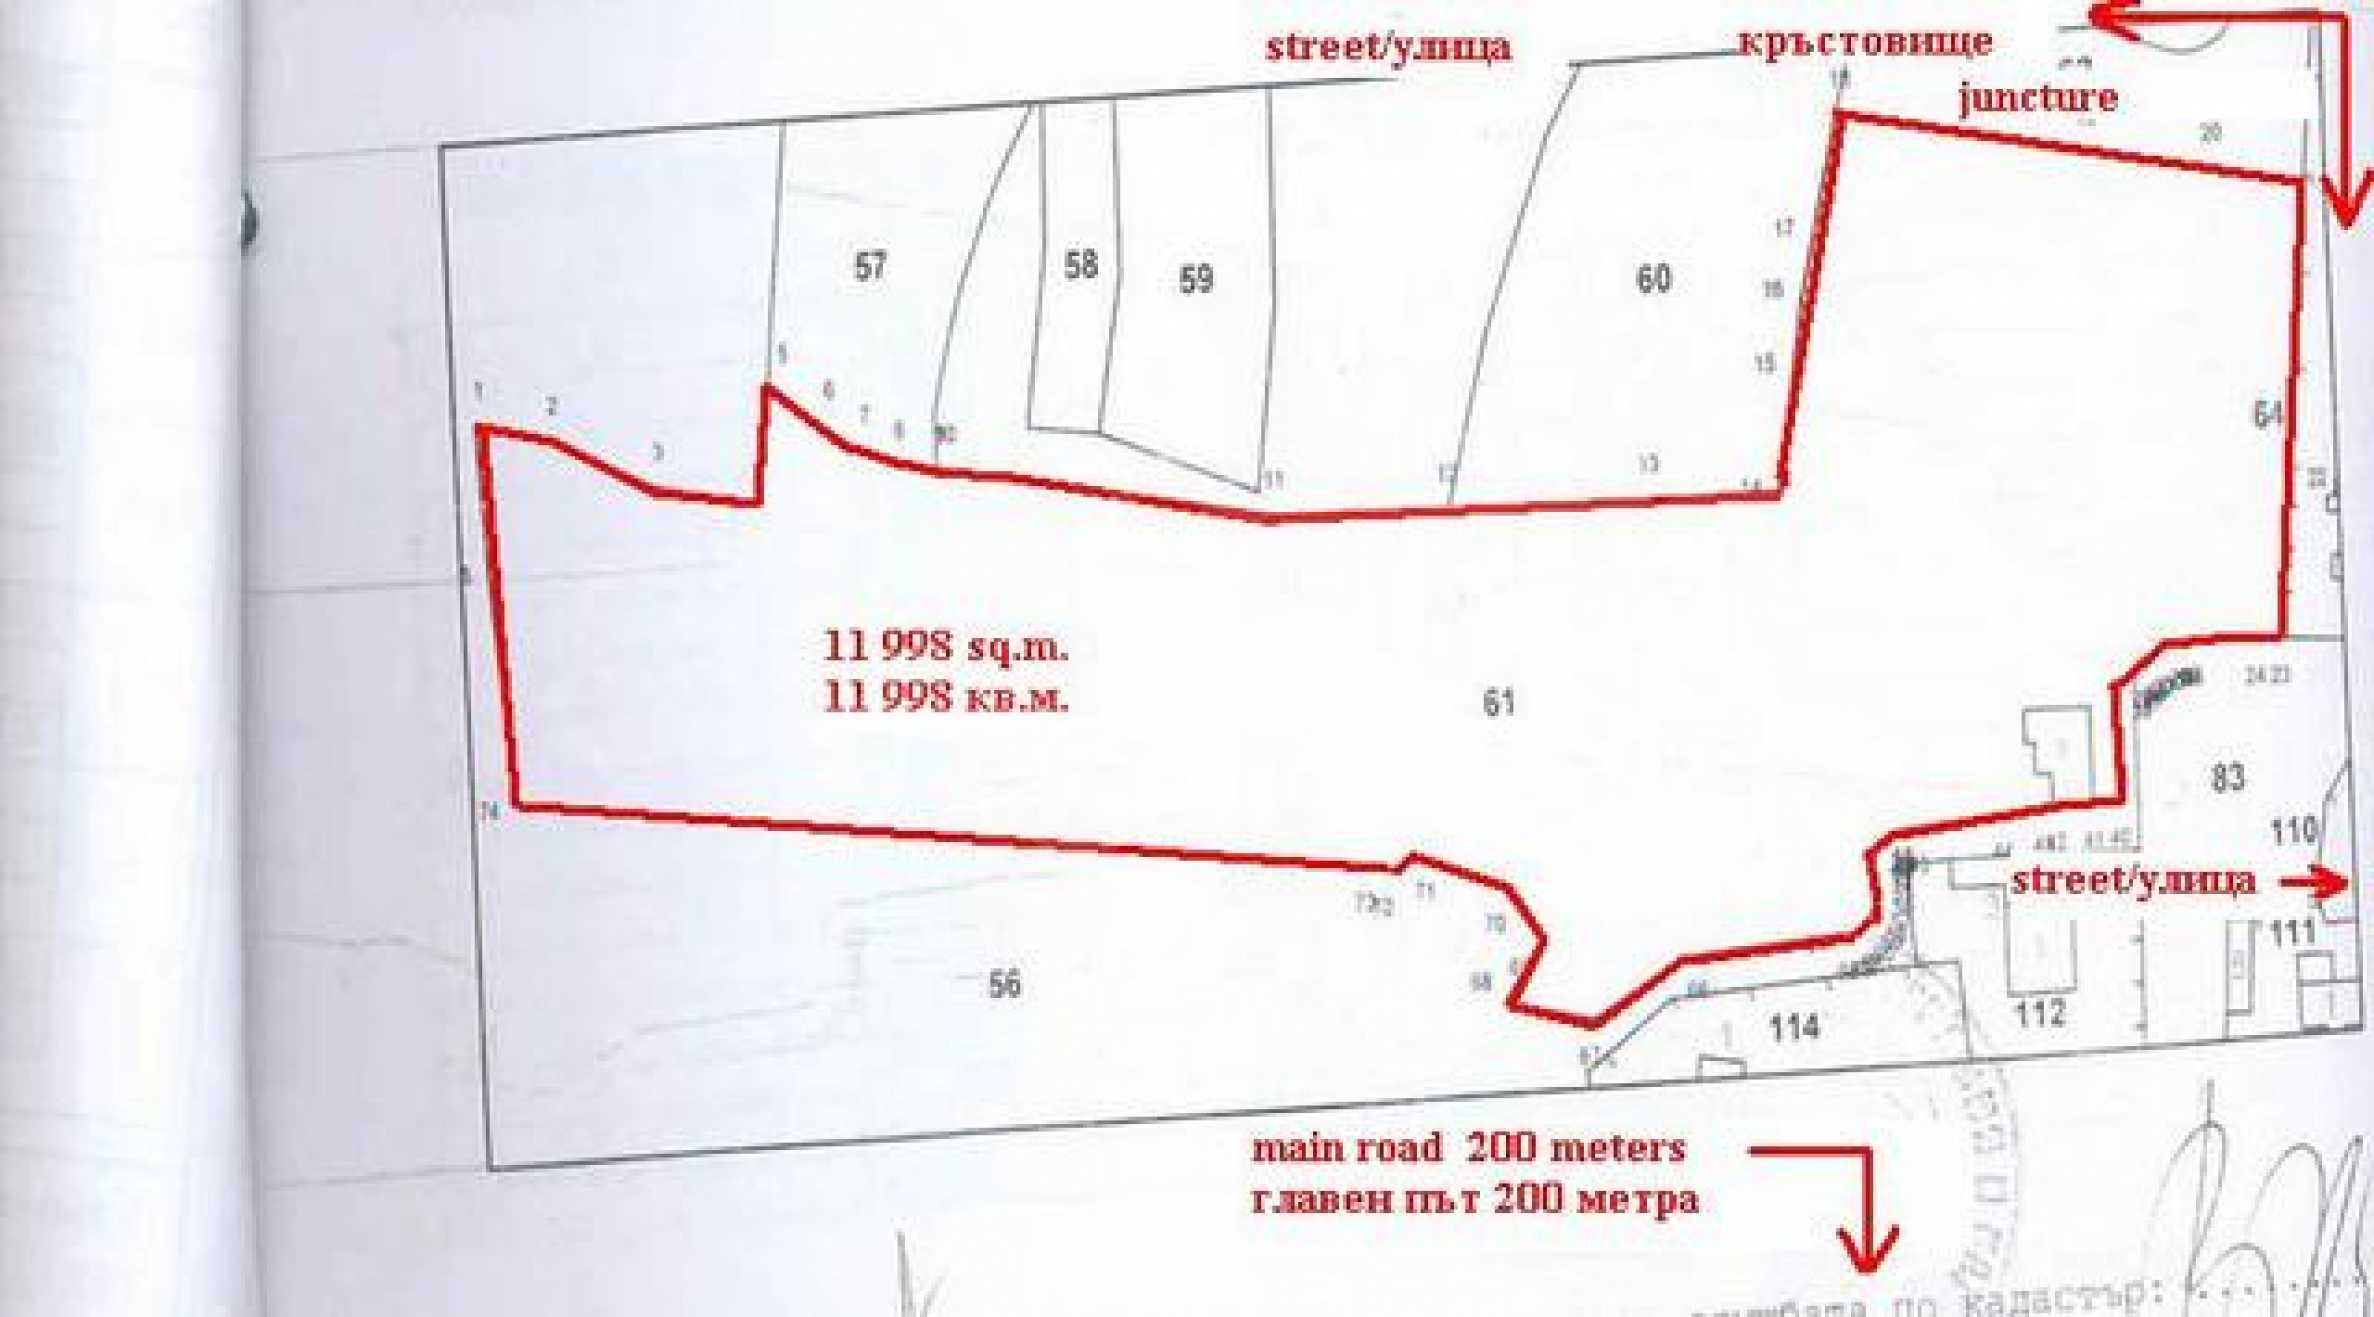 good sized plot for developement 5